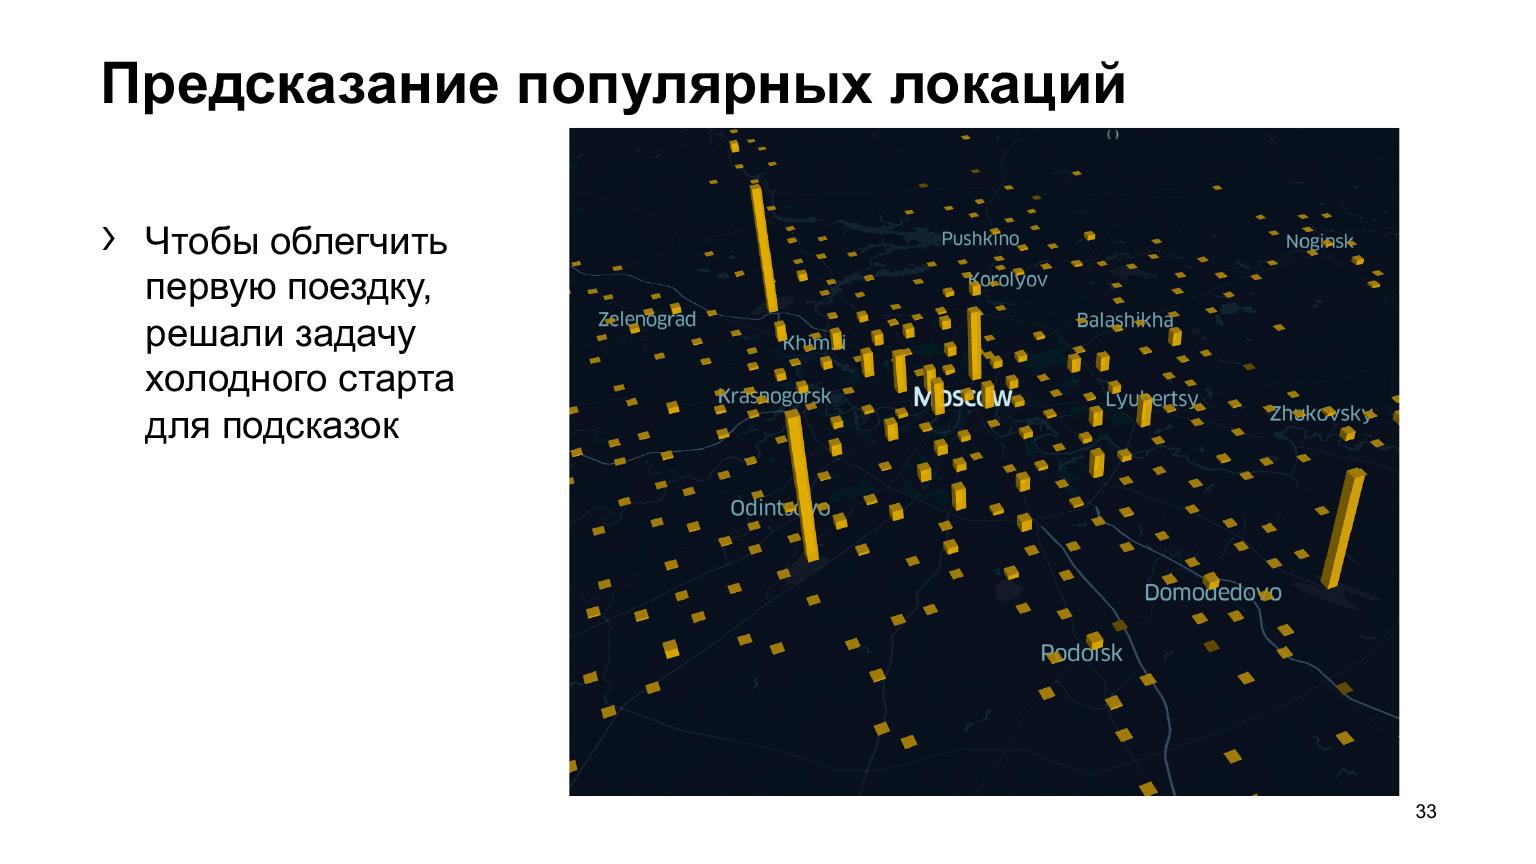 Как коронавирус повлиял на ML-проекты Такси, Еды и Лавки. Доклад Яндекса - 12